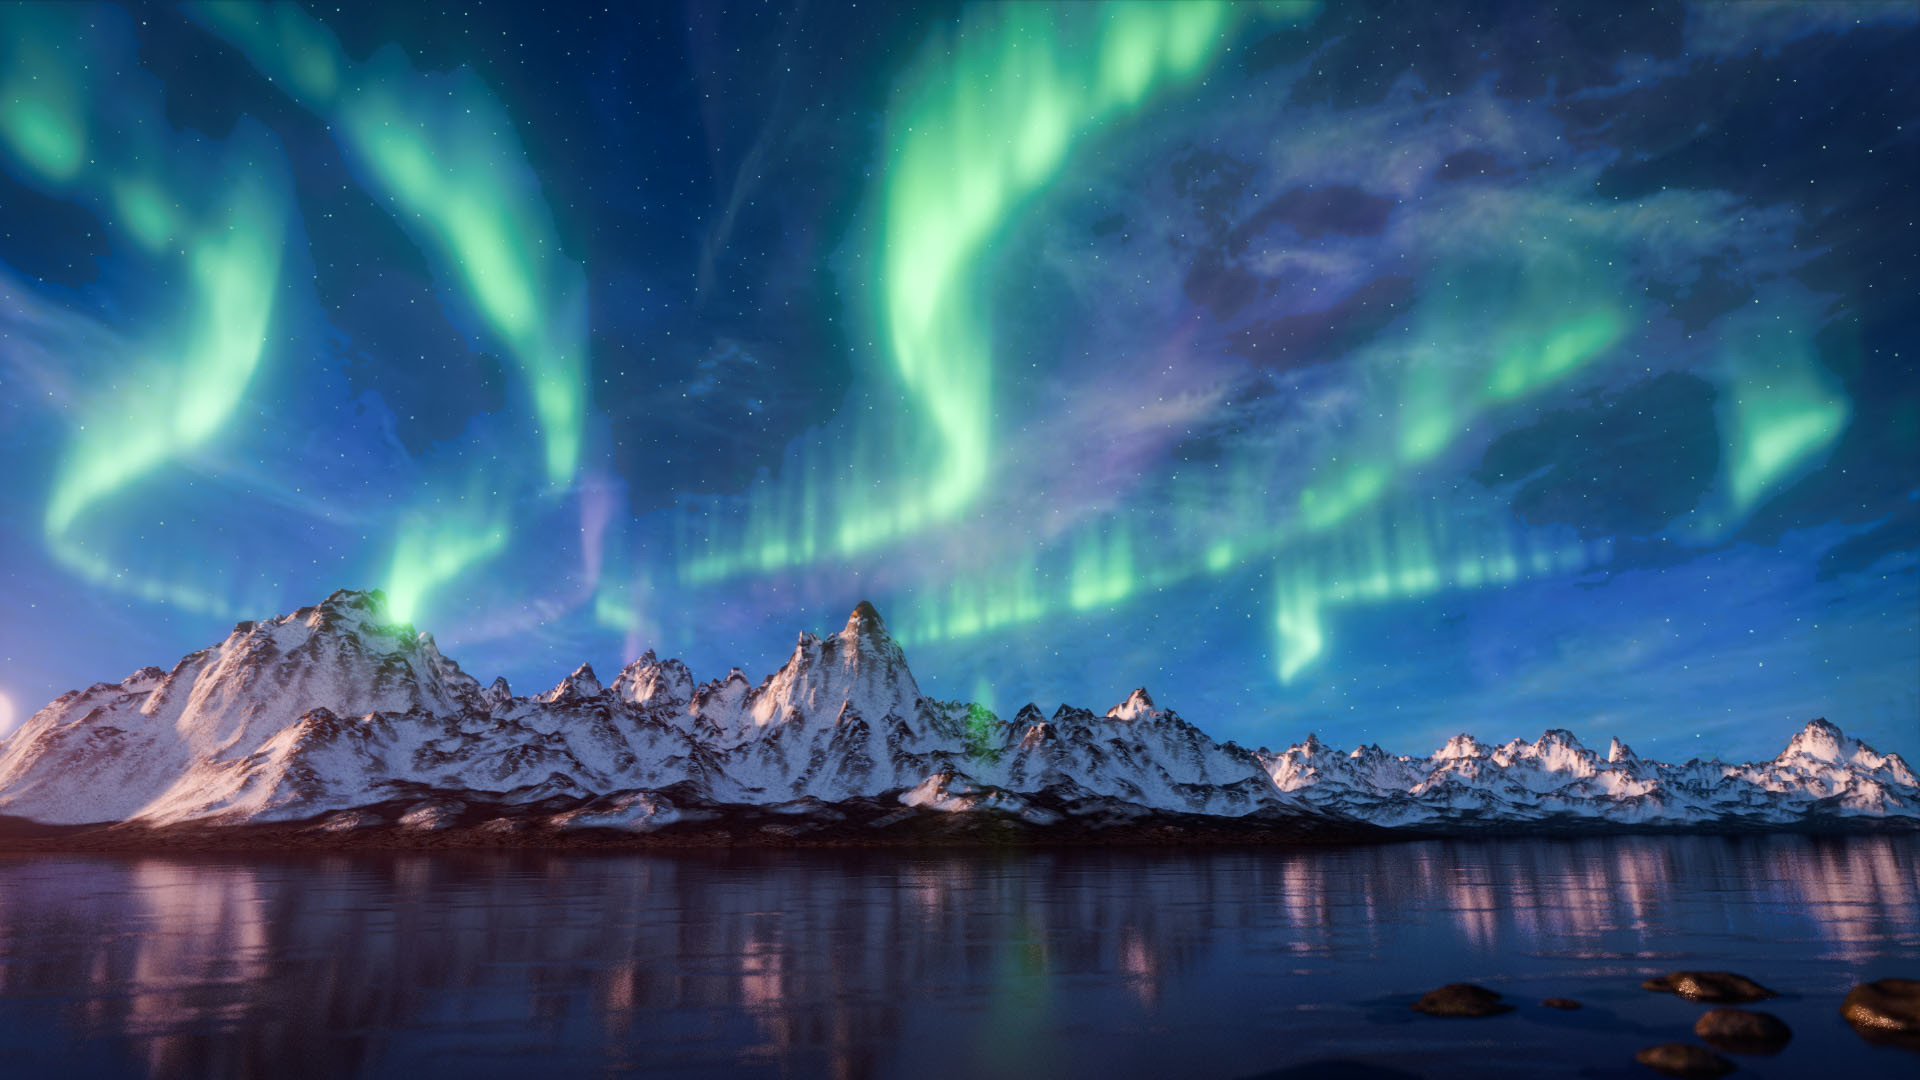 Artstation - Aurora Borealis Steve Lund